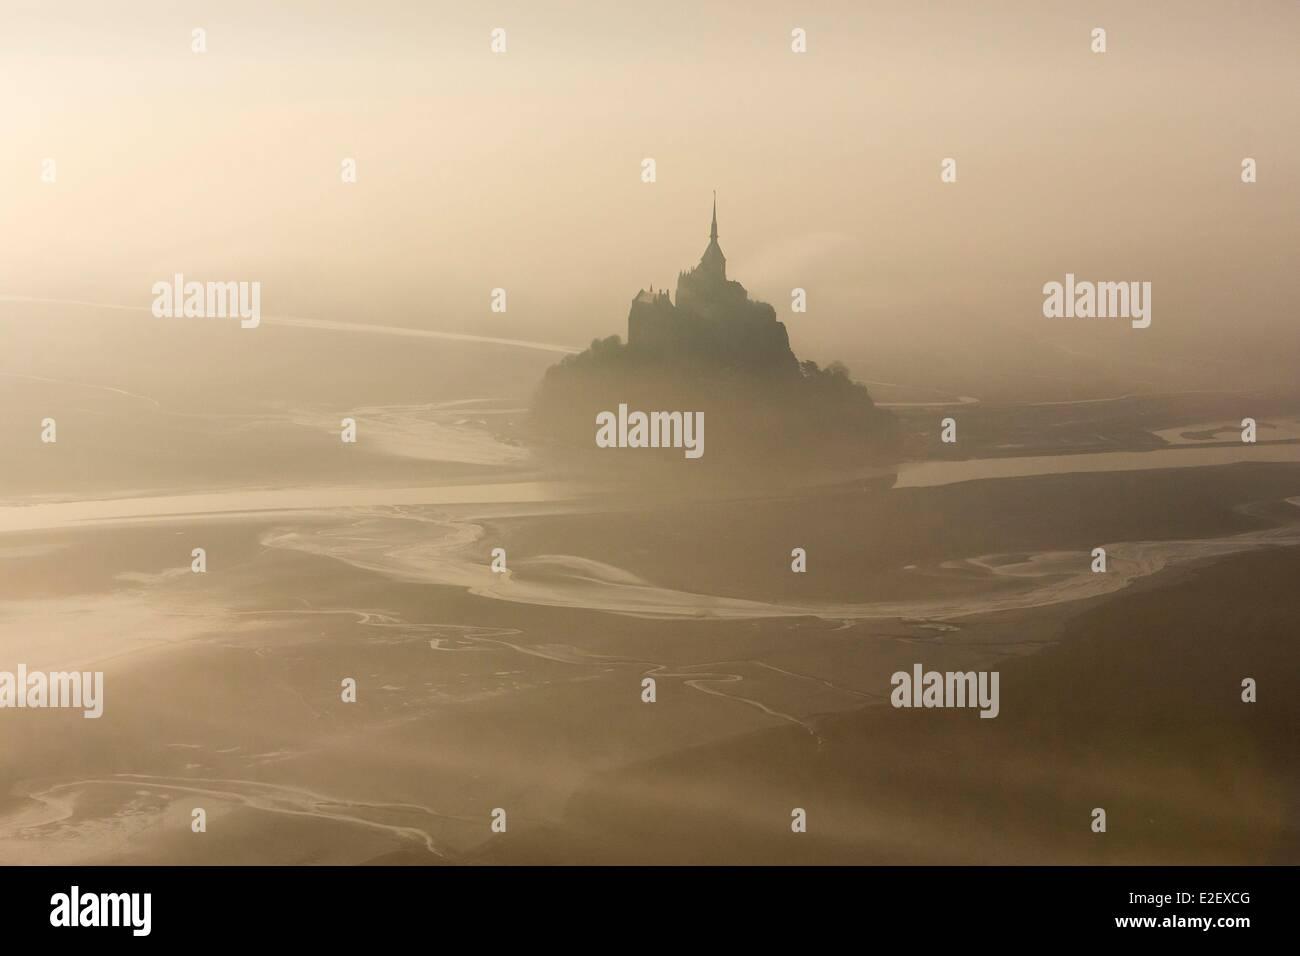 Frankreich, Manche, Mont Saint Michel Bay, als UNESCO-Weltkulturerbe, Mont Saint-Michel (Luftbild) Stockbild